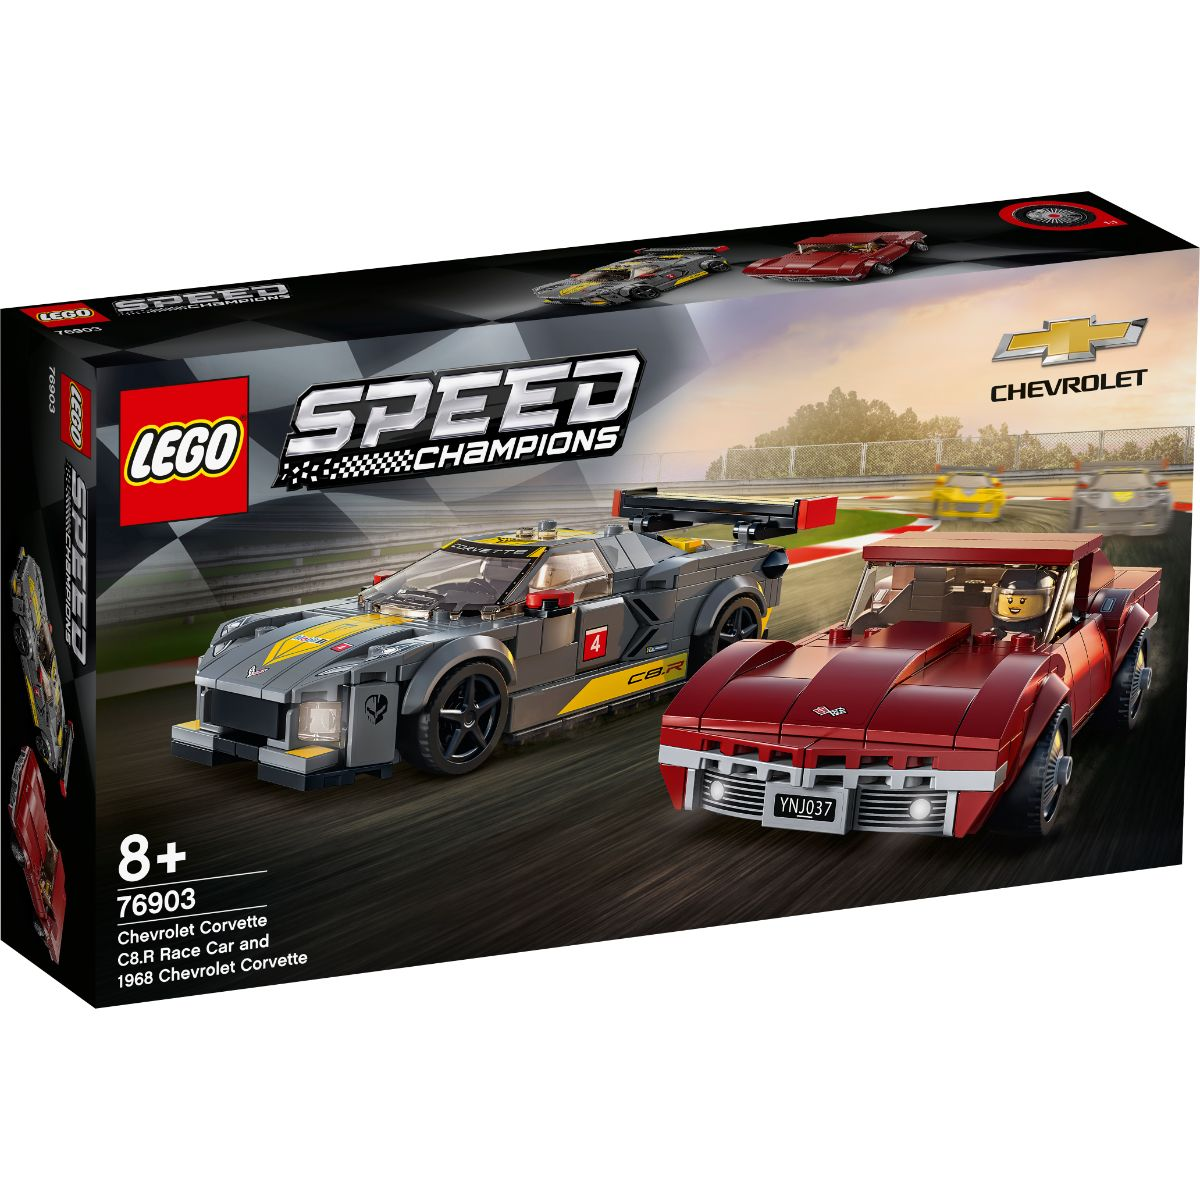 LEGO® Speed Champions - Masina de curse Chevrolet Corvette C8.R si 1968 Chevrolet Corvette (76903)